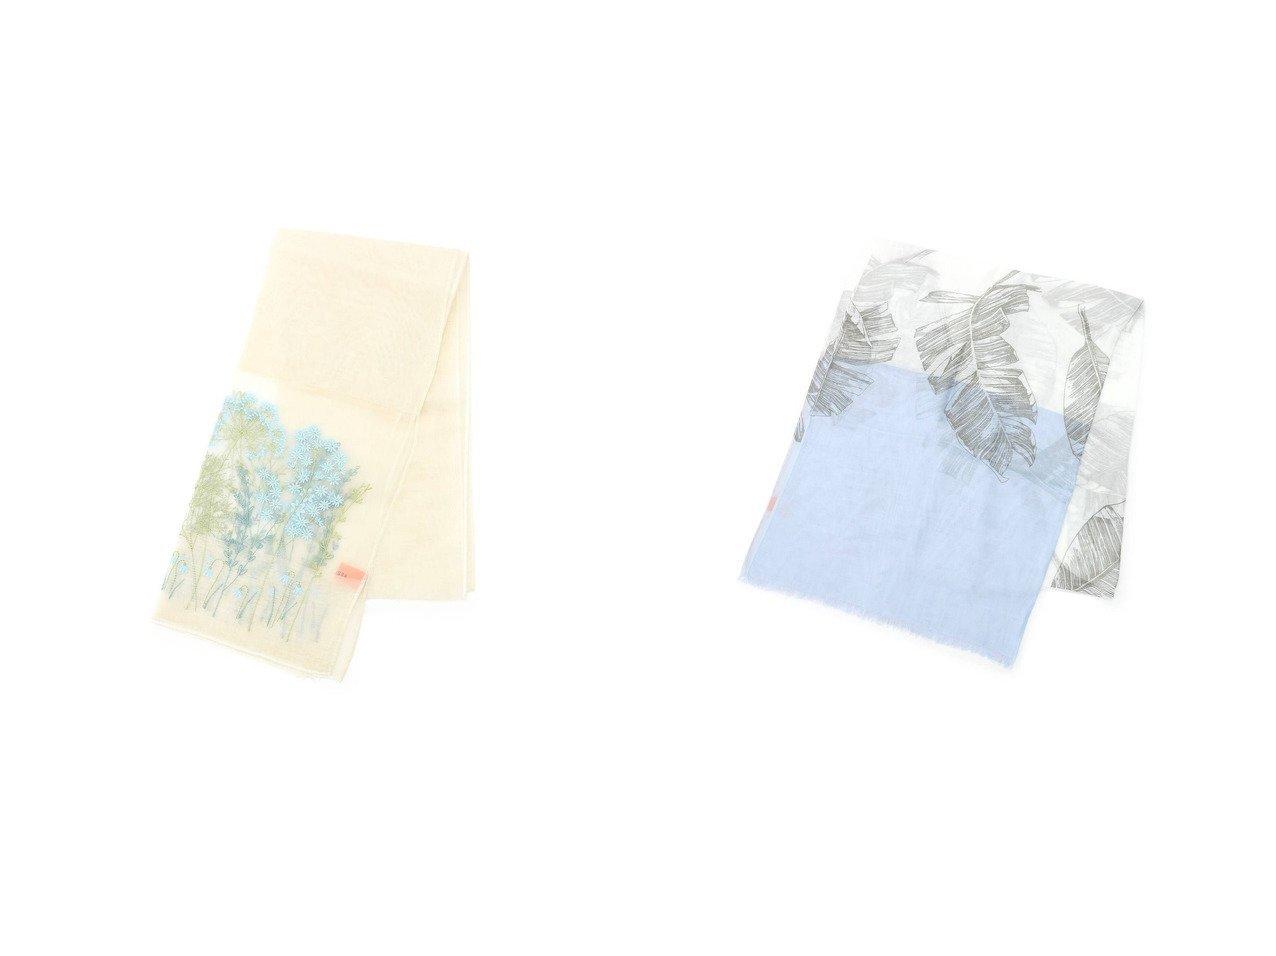 【SunaUna/スーナウーナ】のガーデン刺繍ストール&リーフプリントストール SunaUnaのおすすめ!人気、トレンド・レディースファッションの通販 おすすめで人気の流行・トレンド、ファッションの通販商品 メンズファッション・キッズファッション・インテリア・家具・レディースファッション・服の通販 founy(ファニー) https://founy.com/ ファッション Fashion レディースファッション WOMEN 2021年 2021 2021 春夏 S/S SS Spring/Summer 2021 S/S 春夏 SS Spring/Summer イエロー オーガンジー ガーデン ストール ボタニカル 春 Spring |ID:crp329100000020107